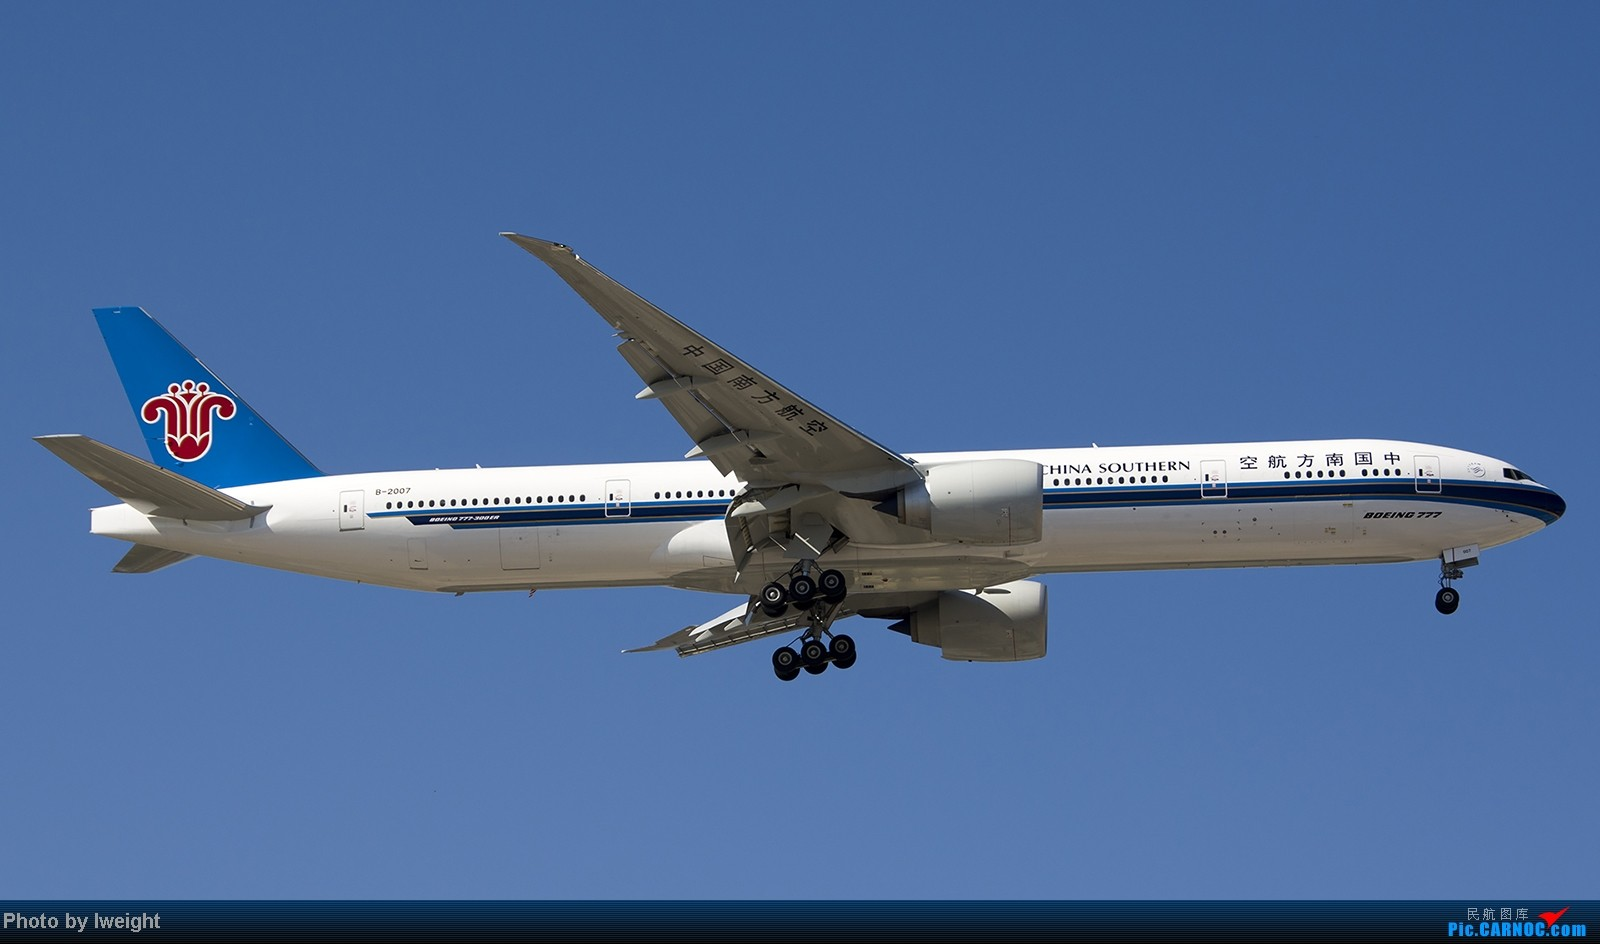 Re:[原创]难得赶上PEK周末好天气,各种常见机型都有收获 BOEING 777-300ER B-2007 中国北京首都机场